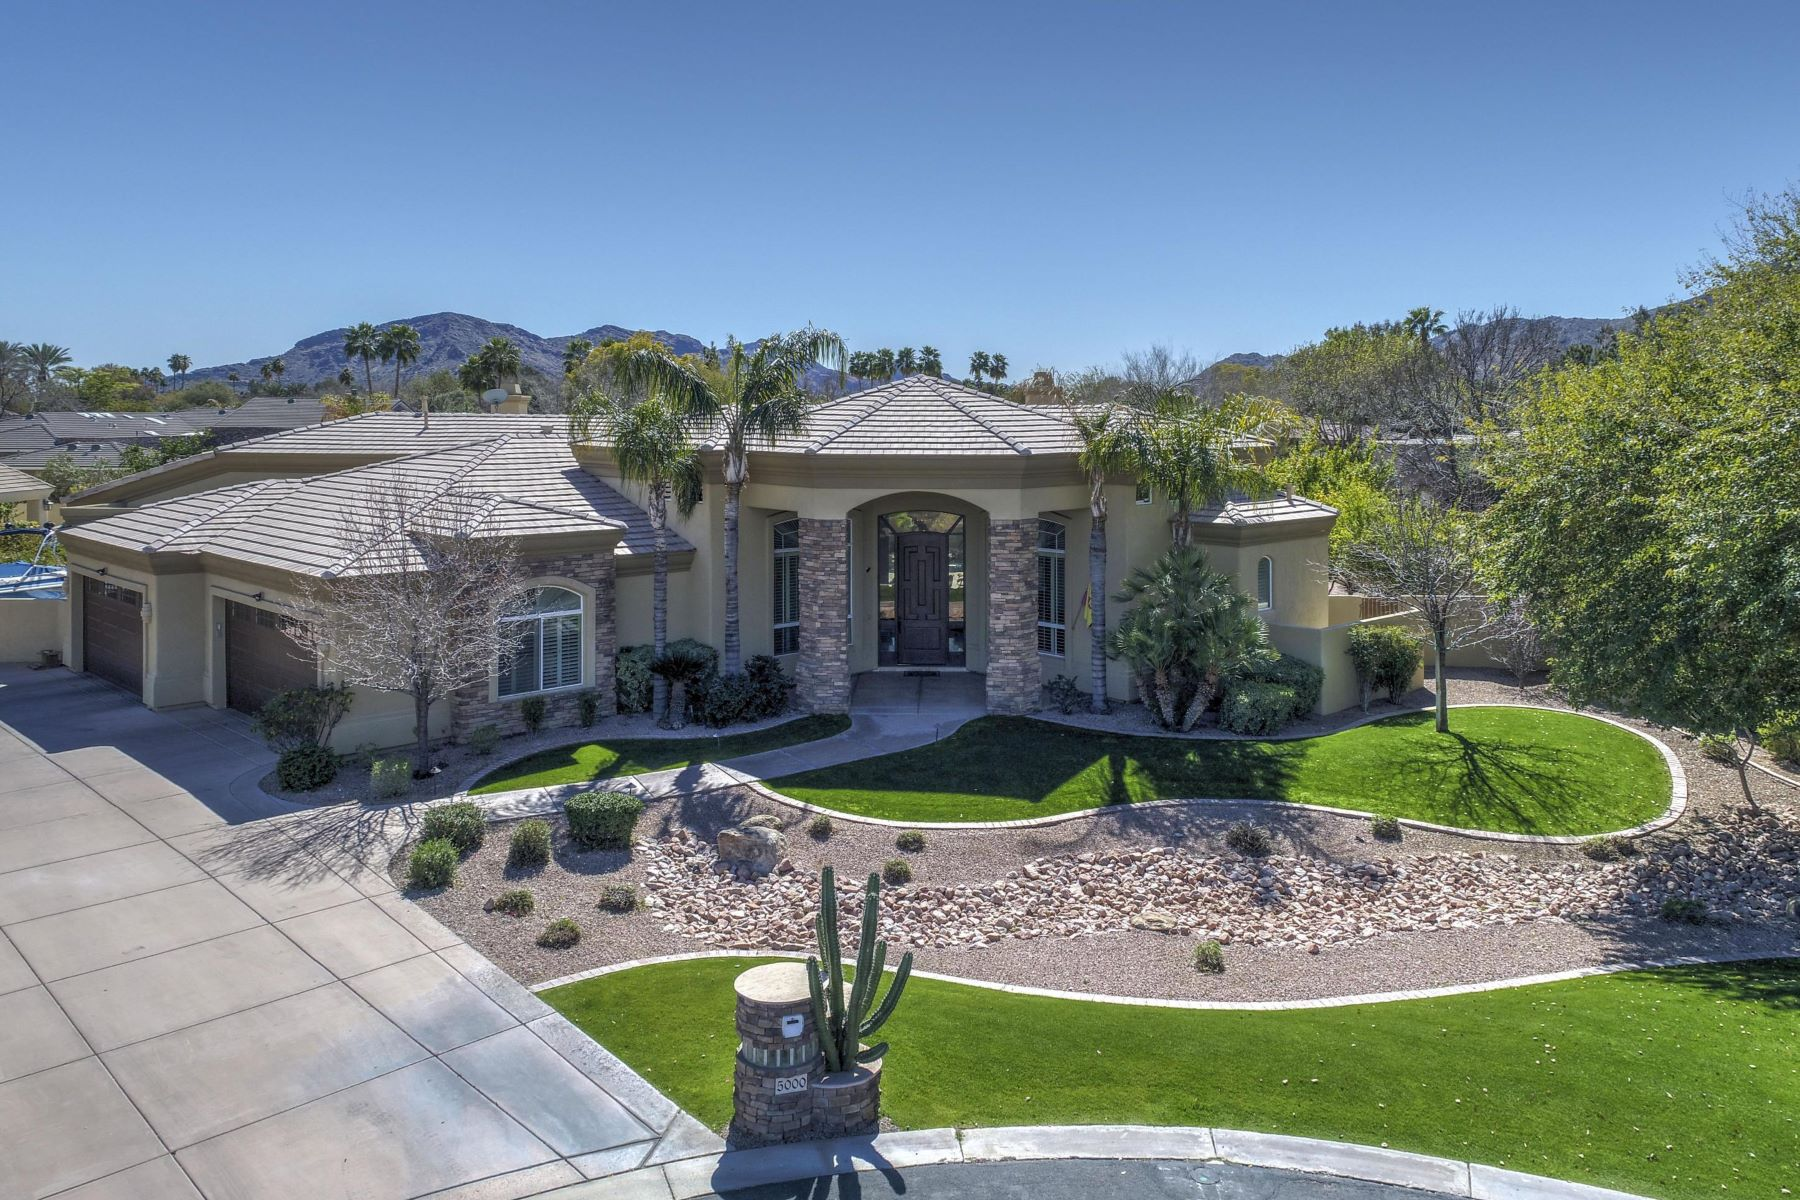 Moradia para Venda às Beautiful Custom Paradise Estates 5000 E Cannon Dr, Paradise Valley, Arizona, 85253 Estados Unidos